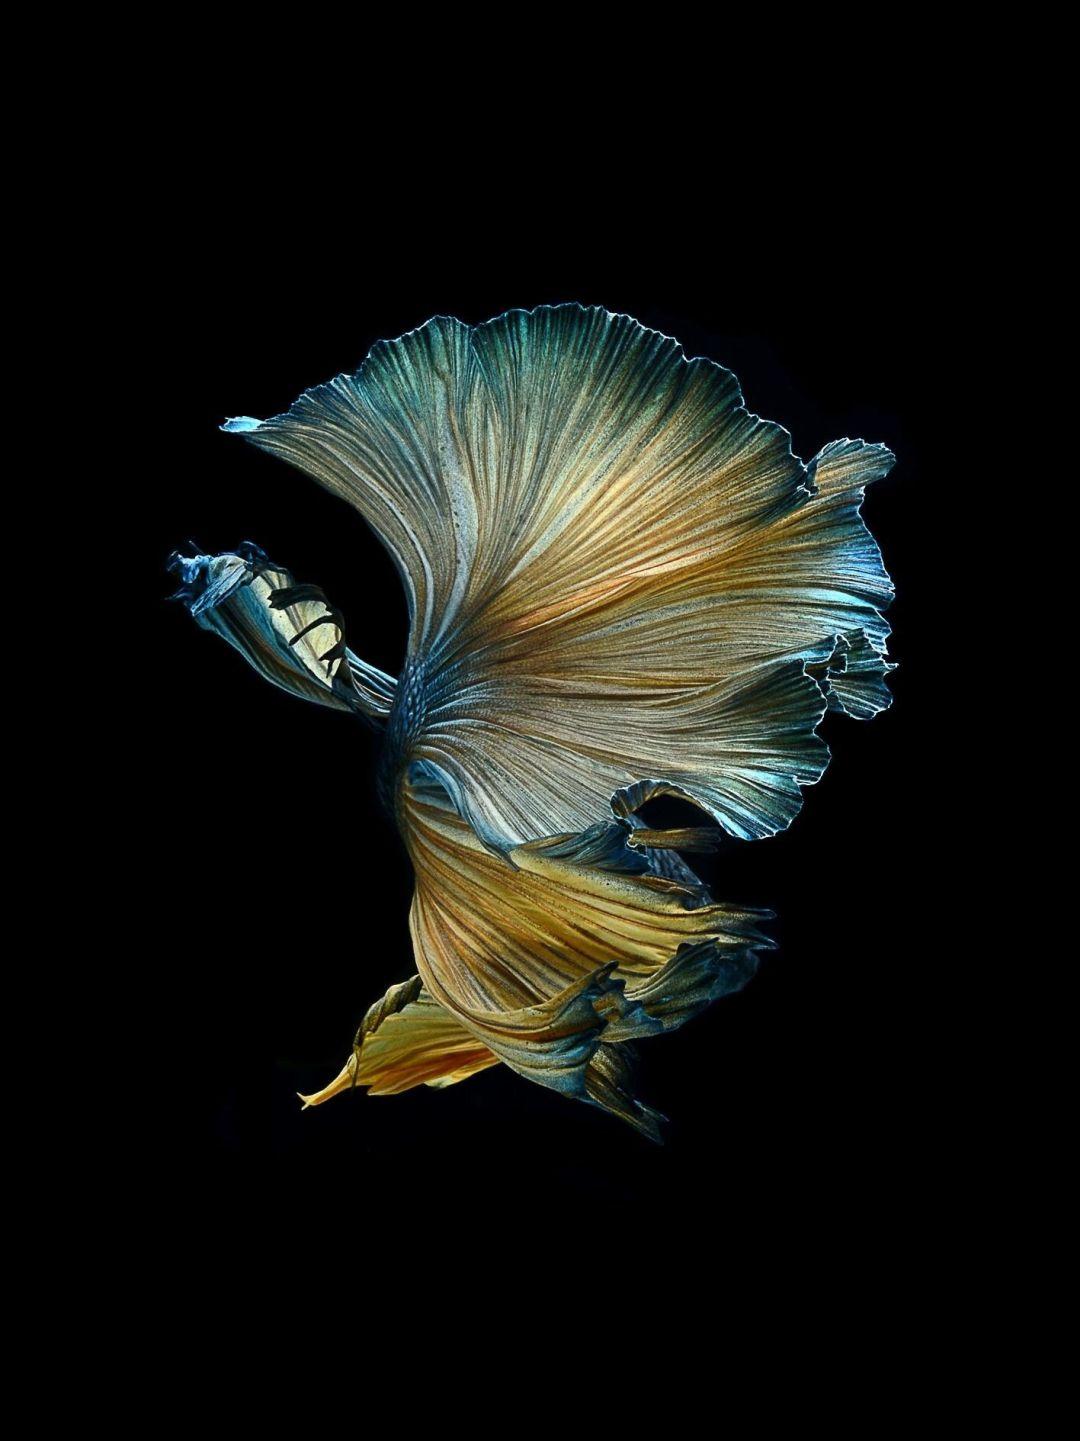 Fish Clean iPhone 6s wallpaper